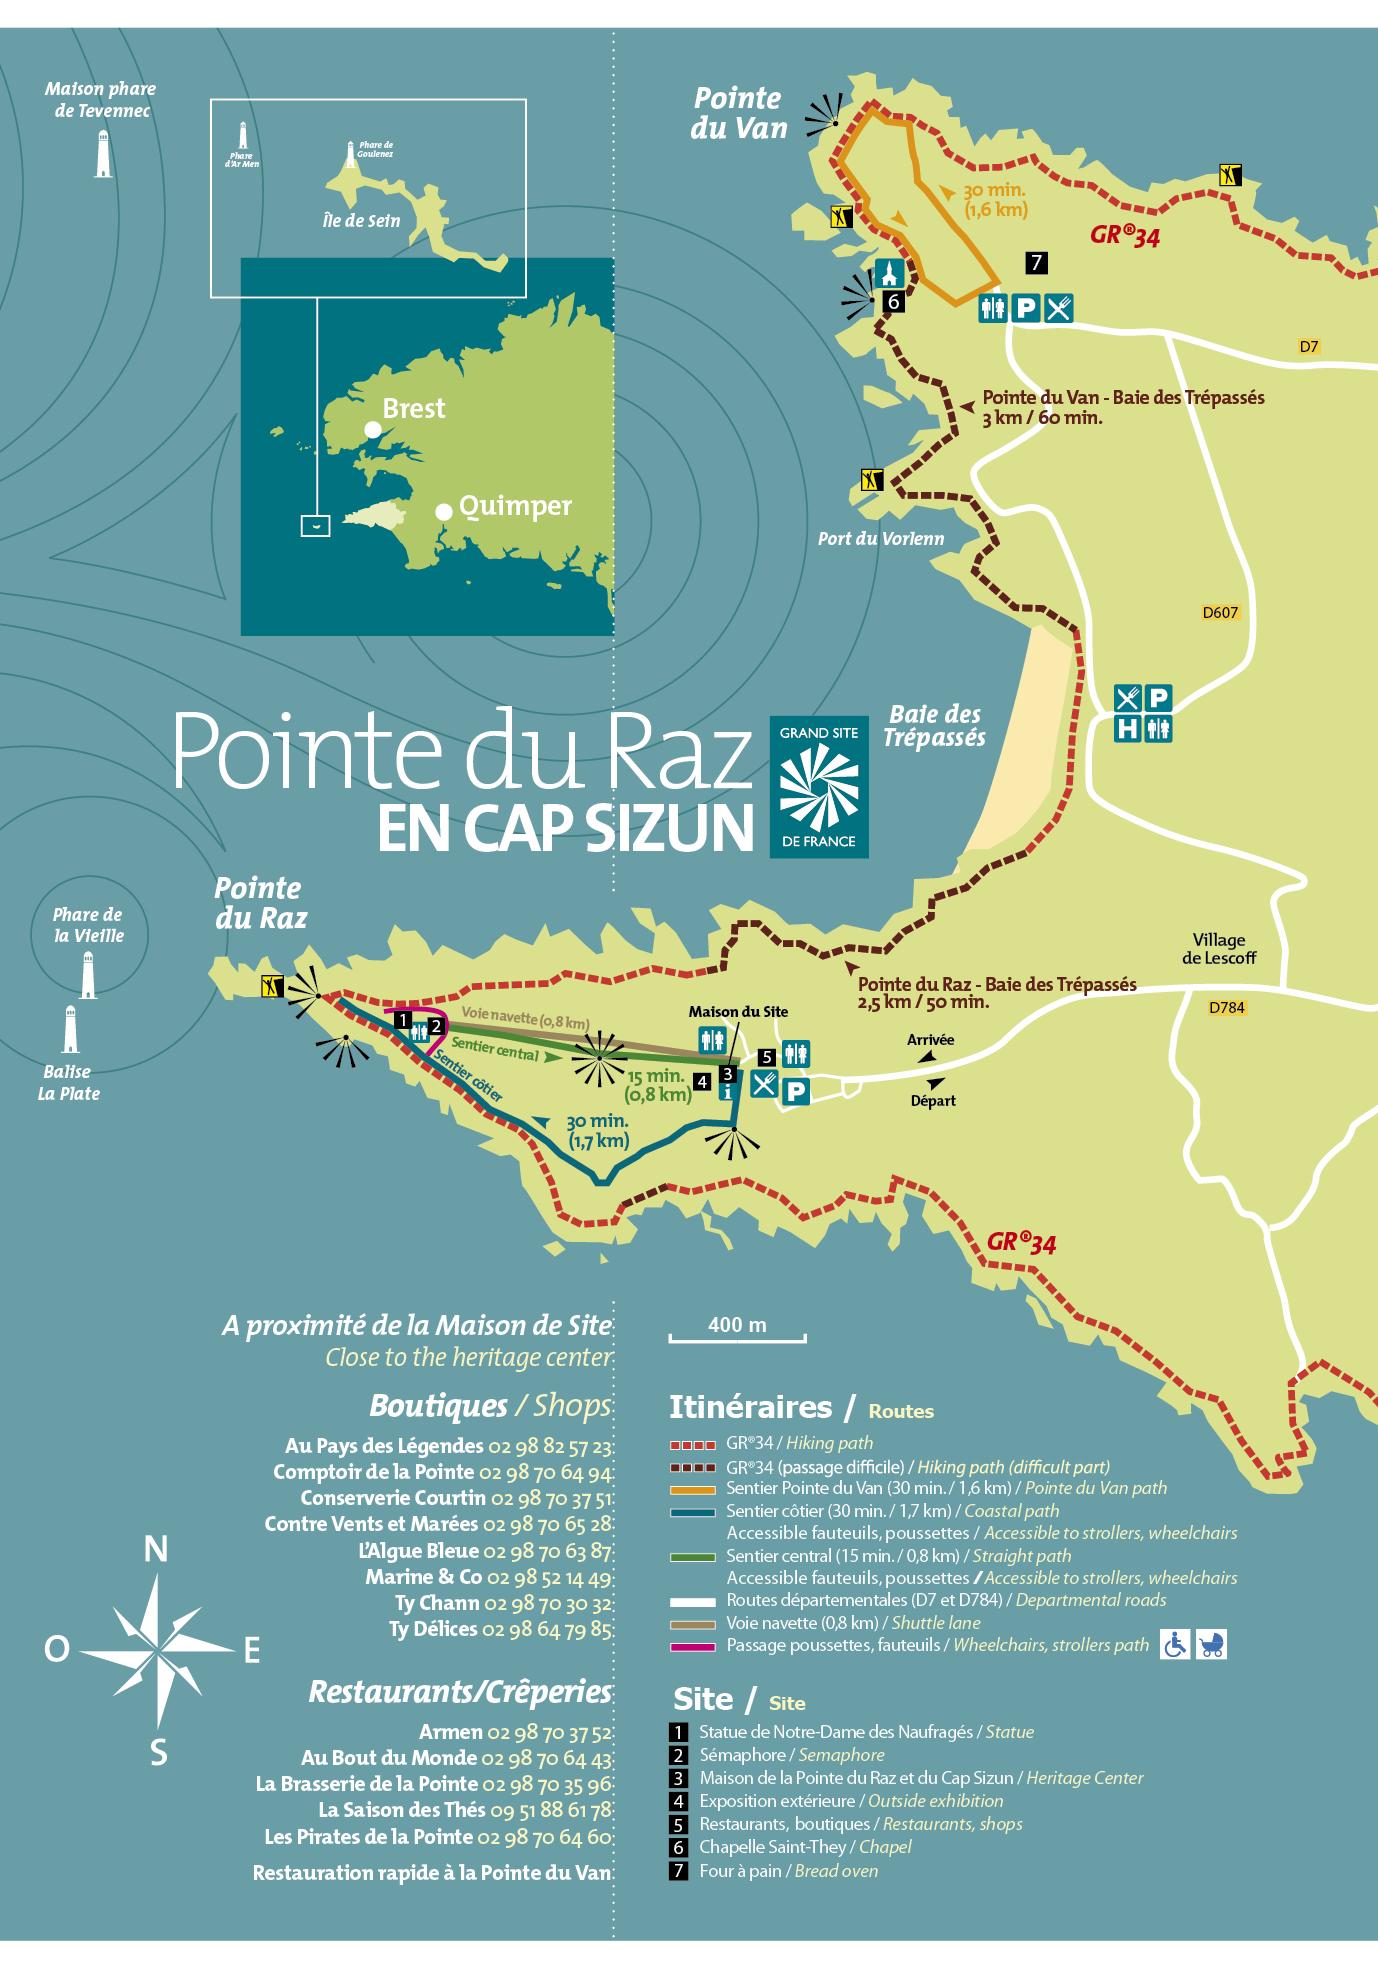 Carte Bretagne Pointe Du Raz.Brochures Pointe Du Raz En Cap Sizun